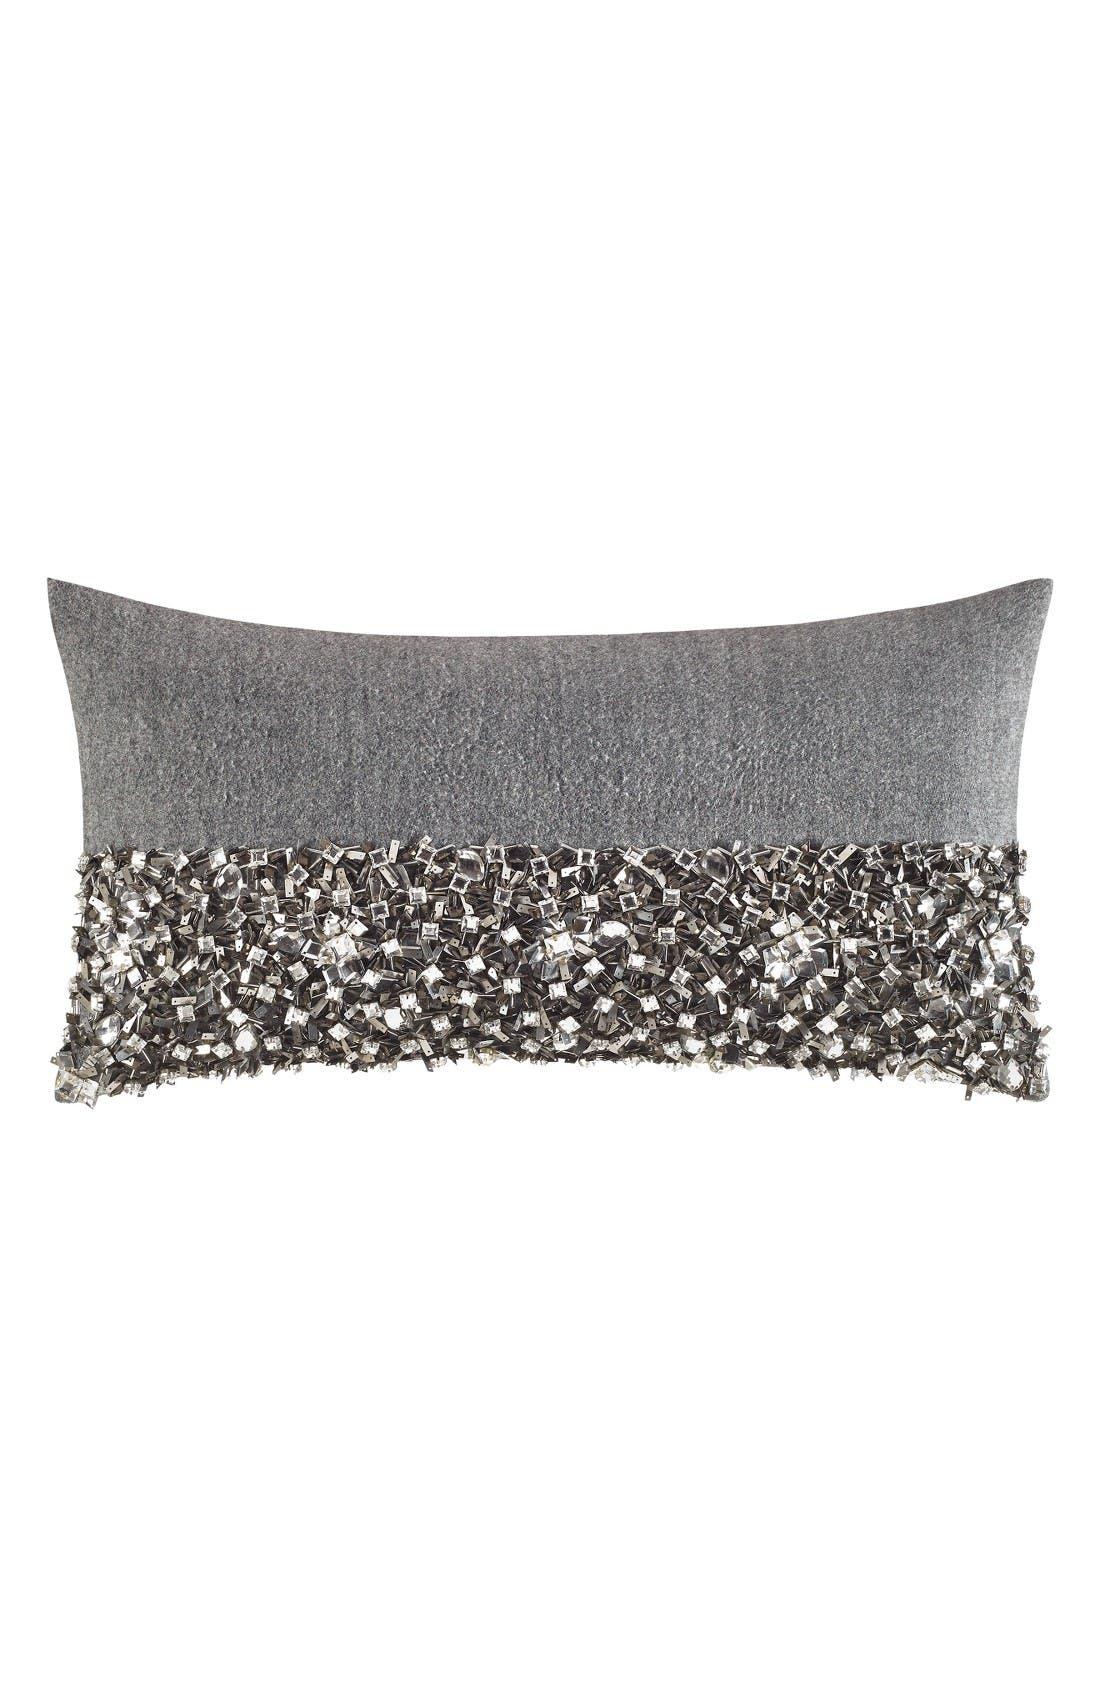 Alternate Image 1 Selected - kate spade new york supernova pillow